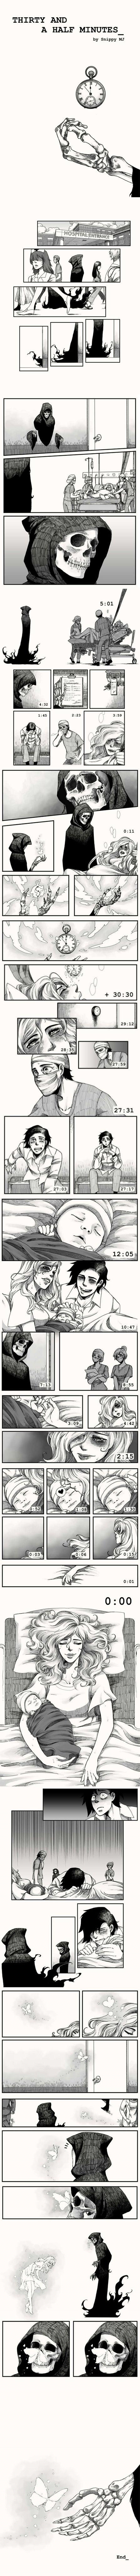 Thirty and a Half Minutes - Web Comic/Manga